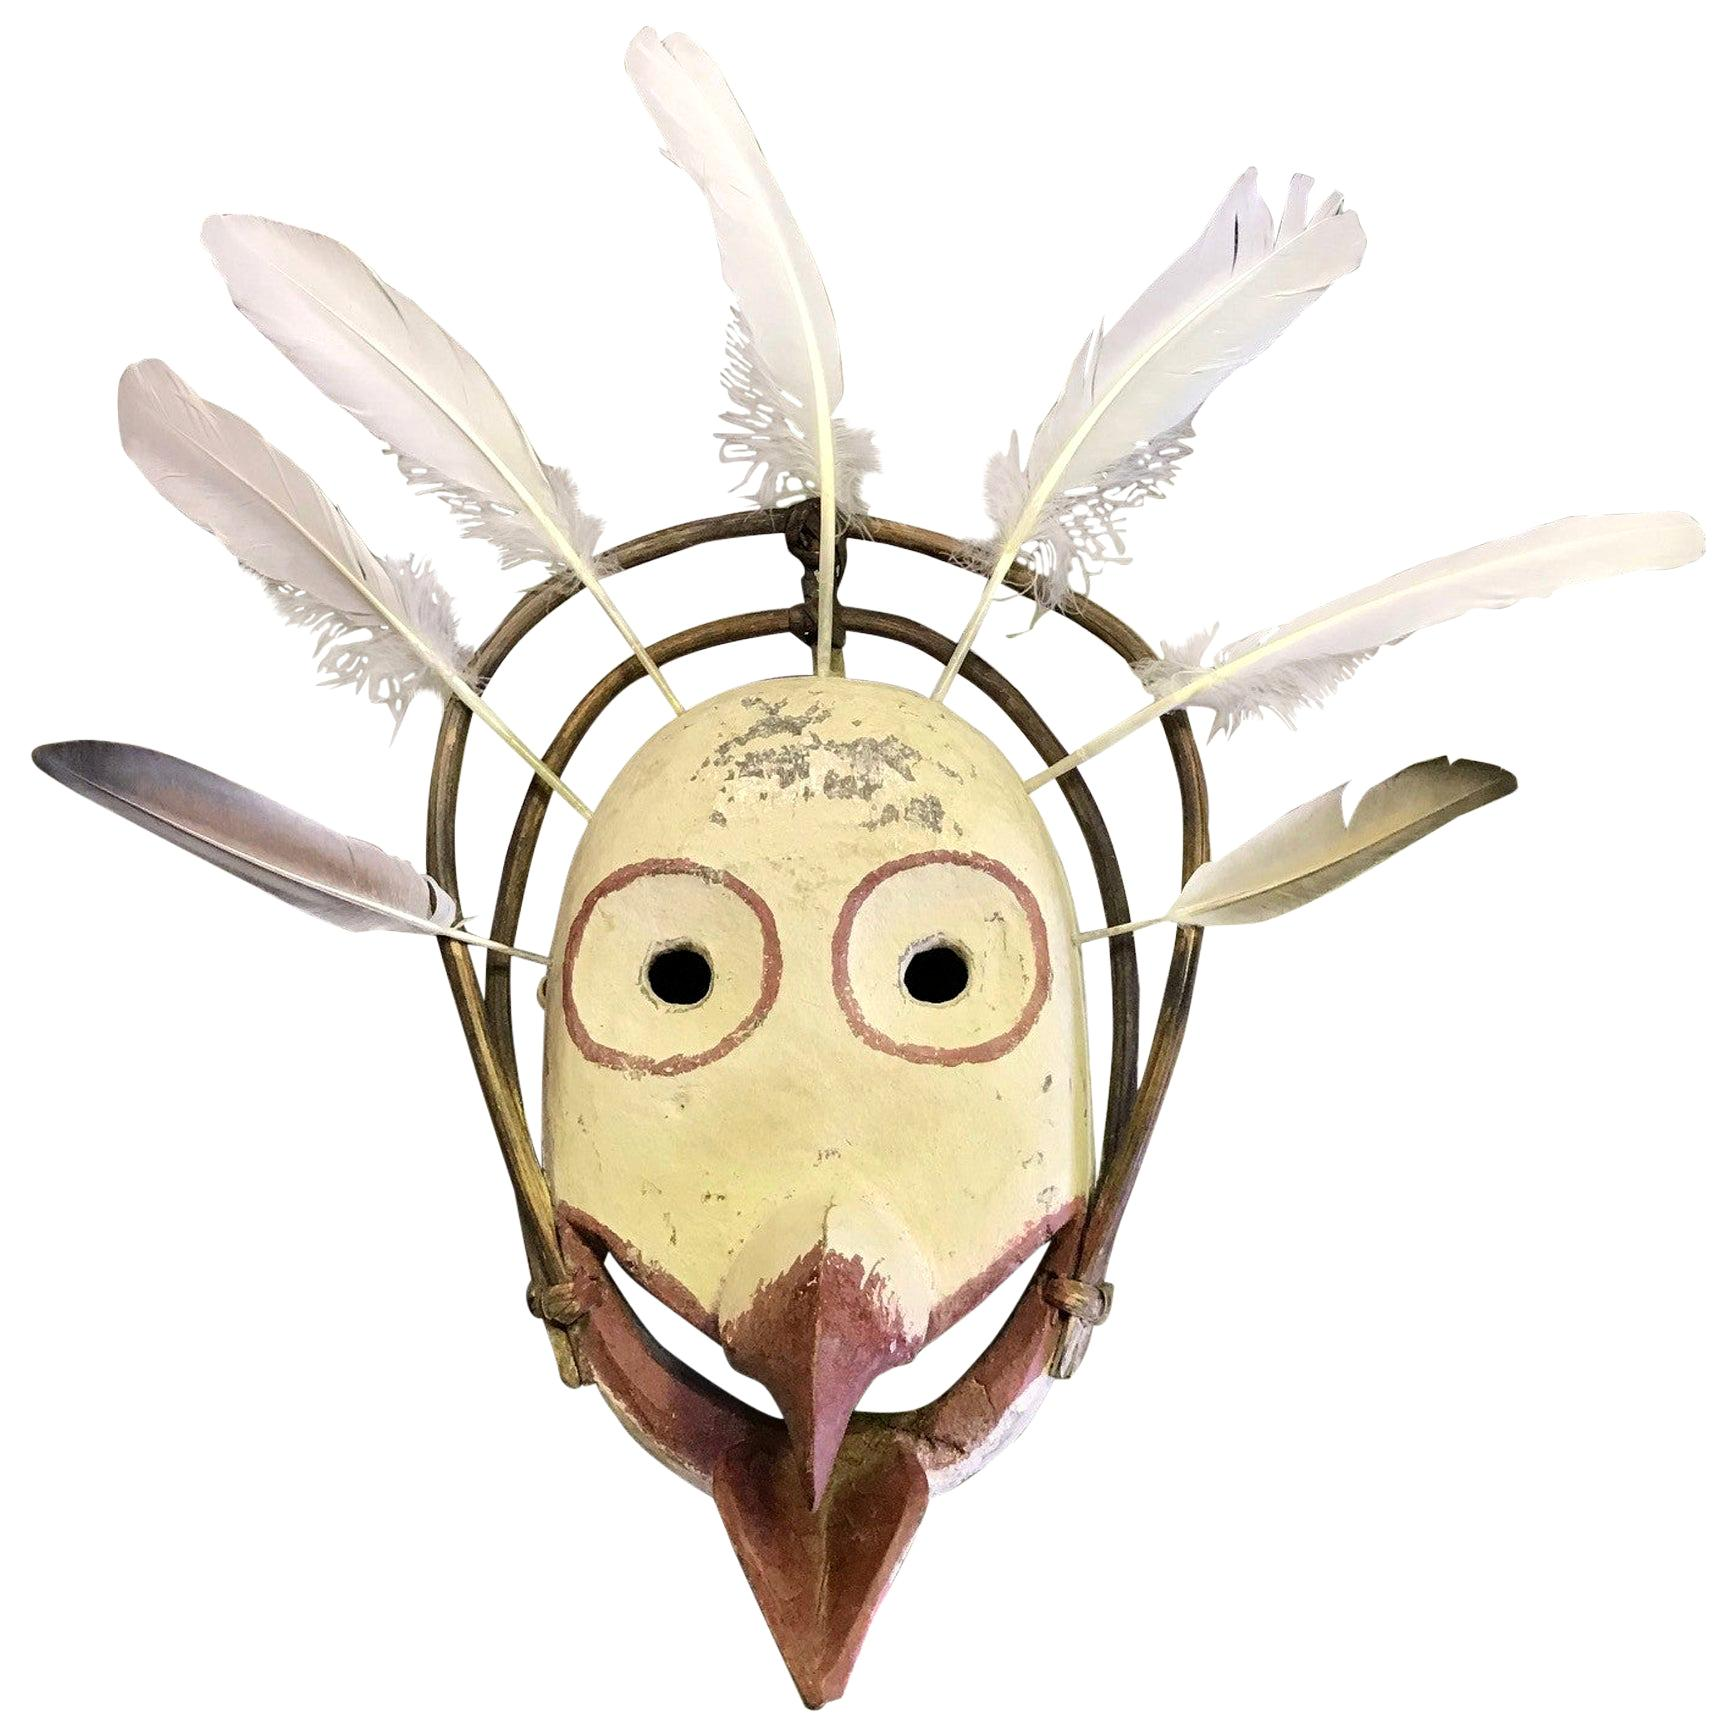 Yupik Yup'ik Native American Alaska Polychrome Wood Anthropomorphic Bird Mask